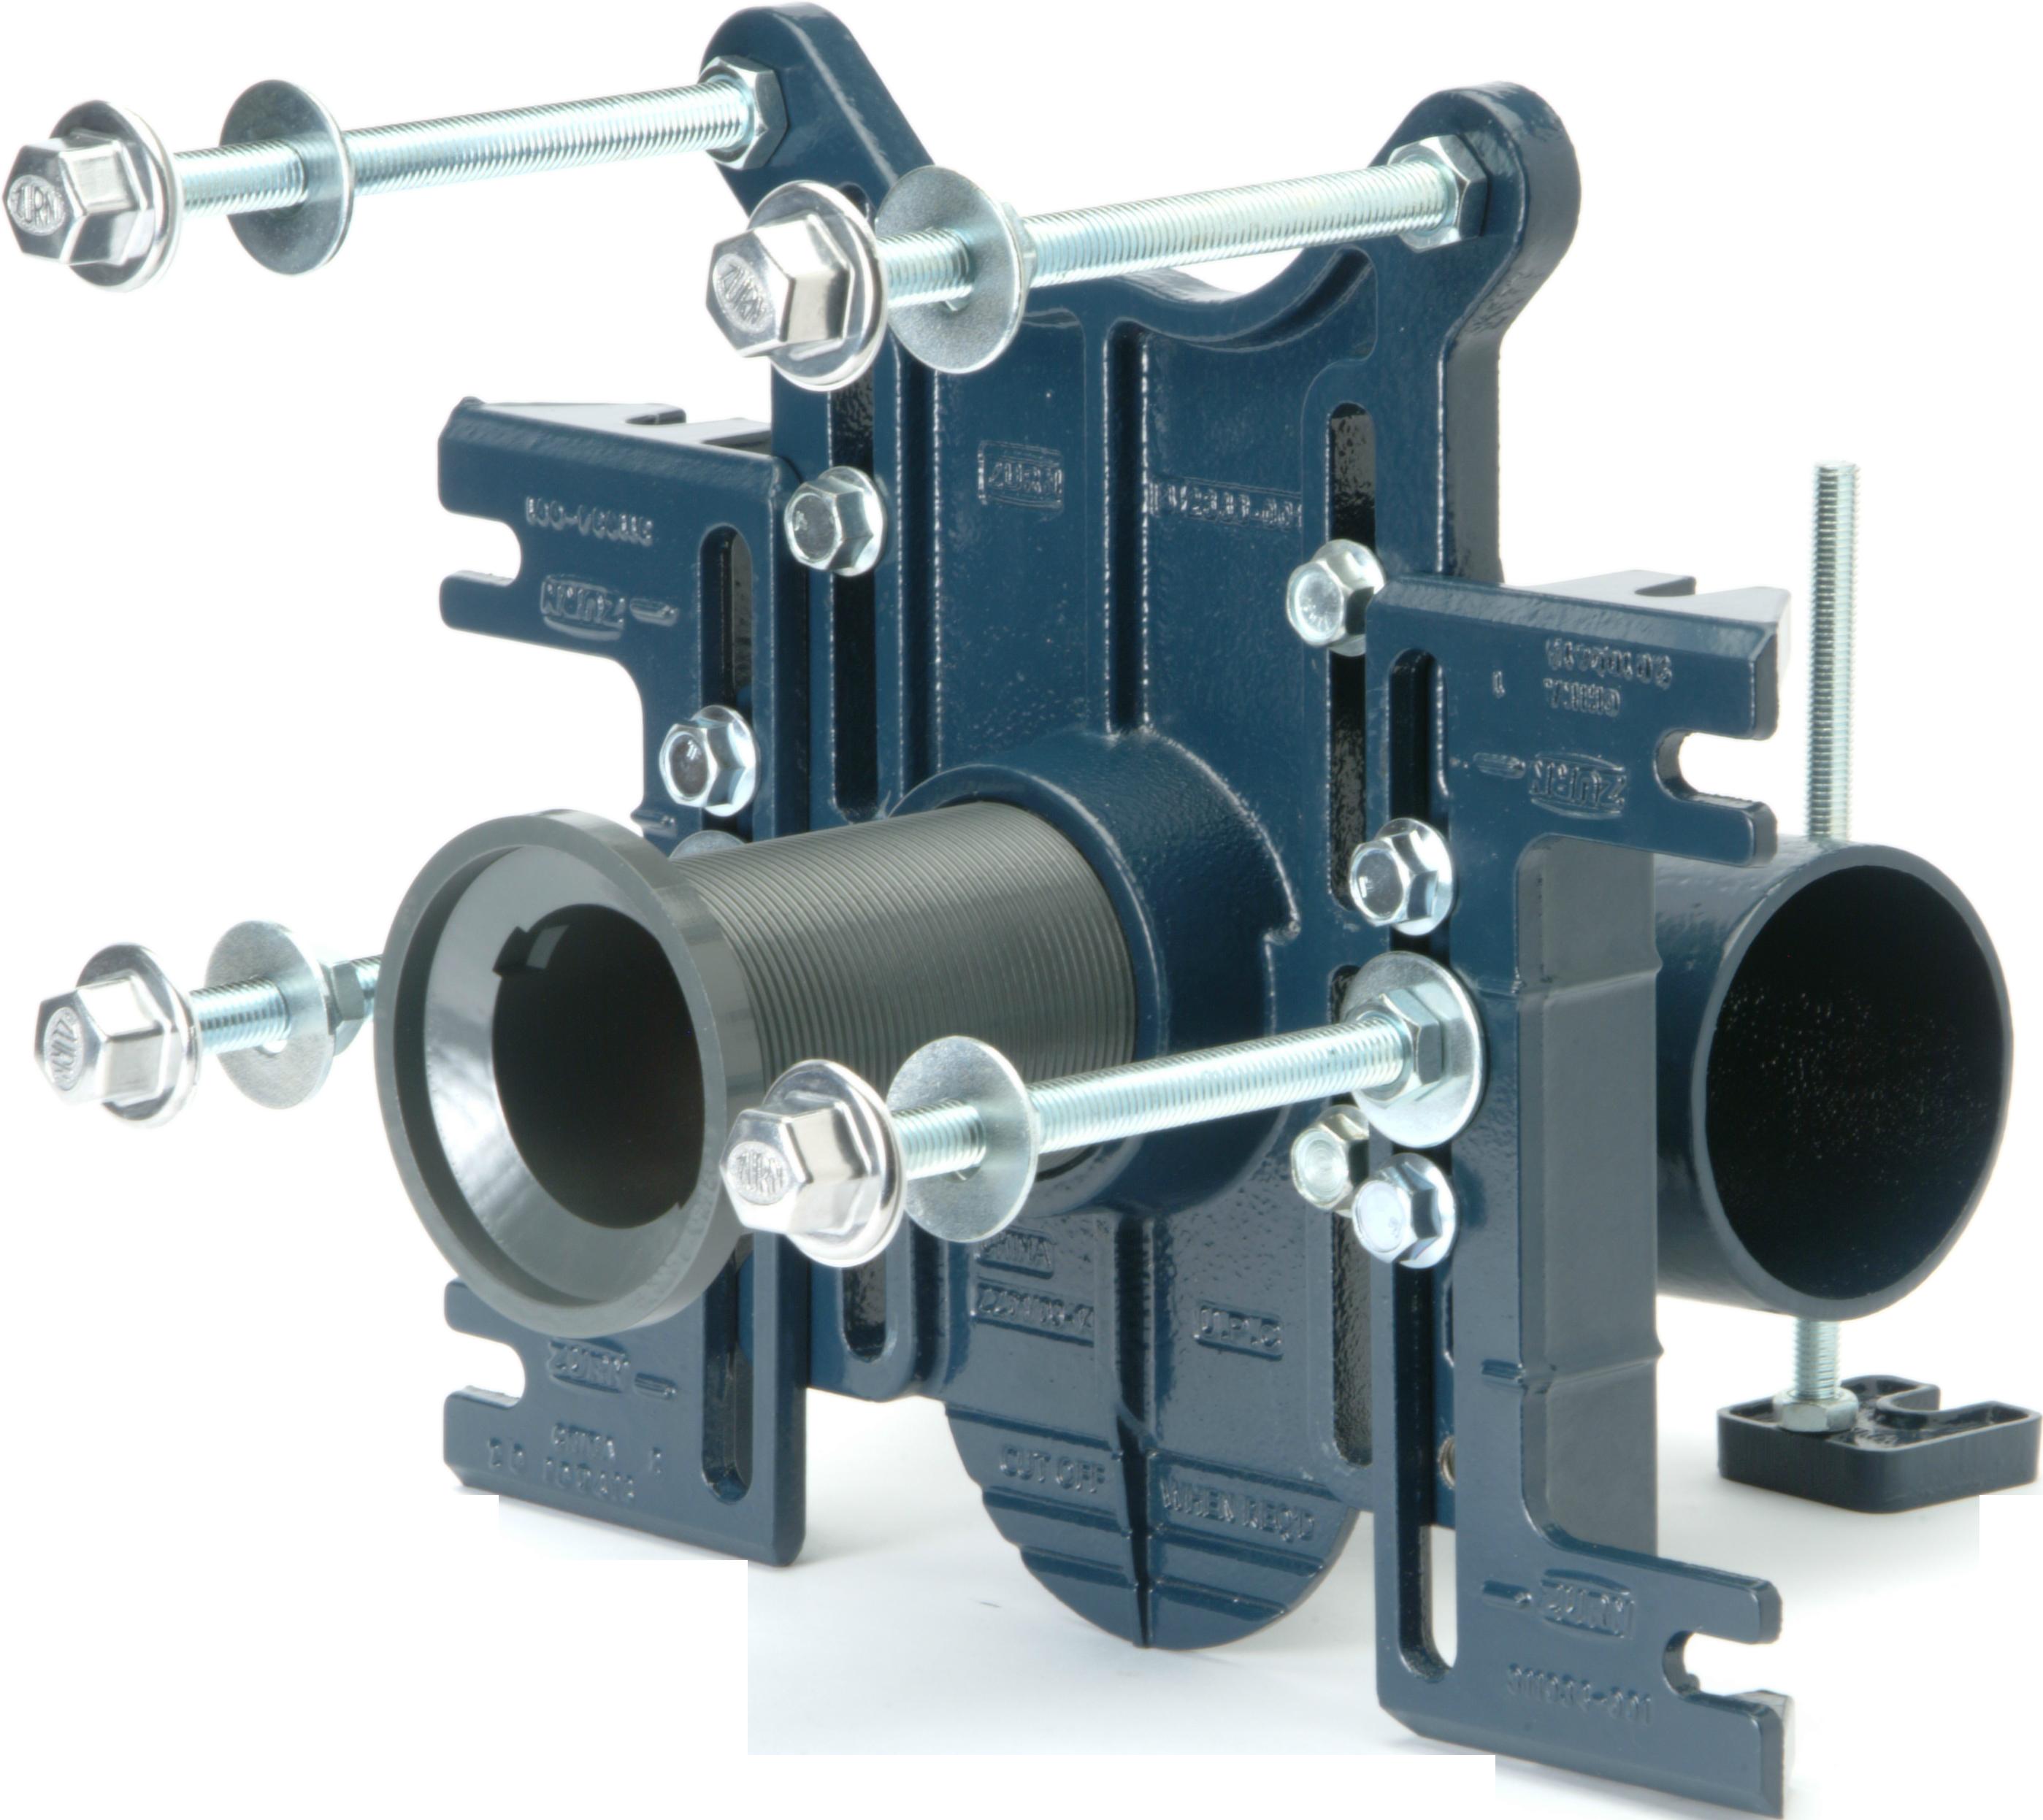 Zurn Innovates New Industry Standard with the Zurn EZCarry